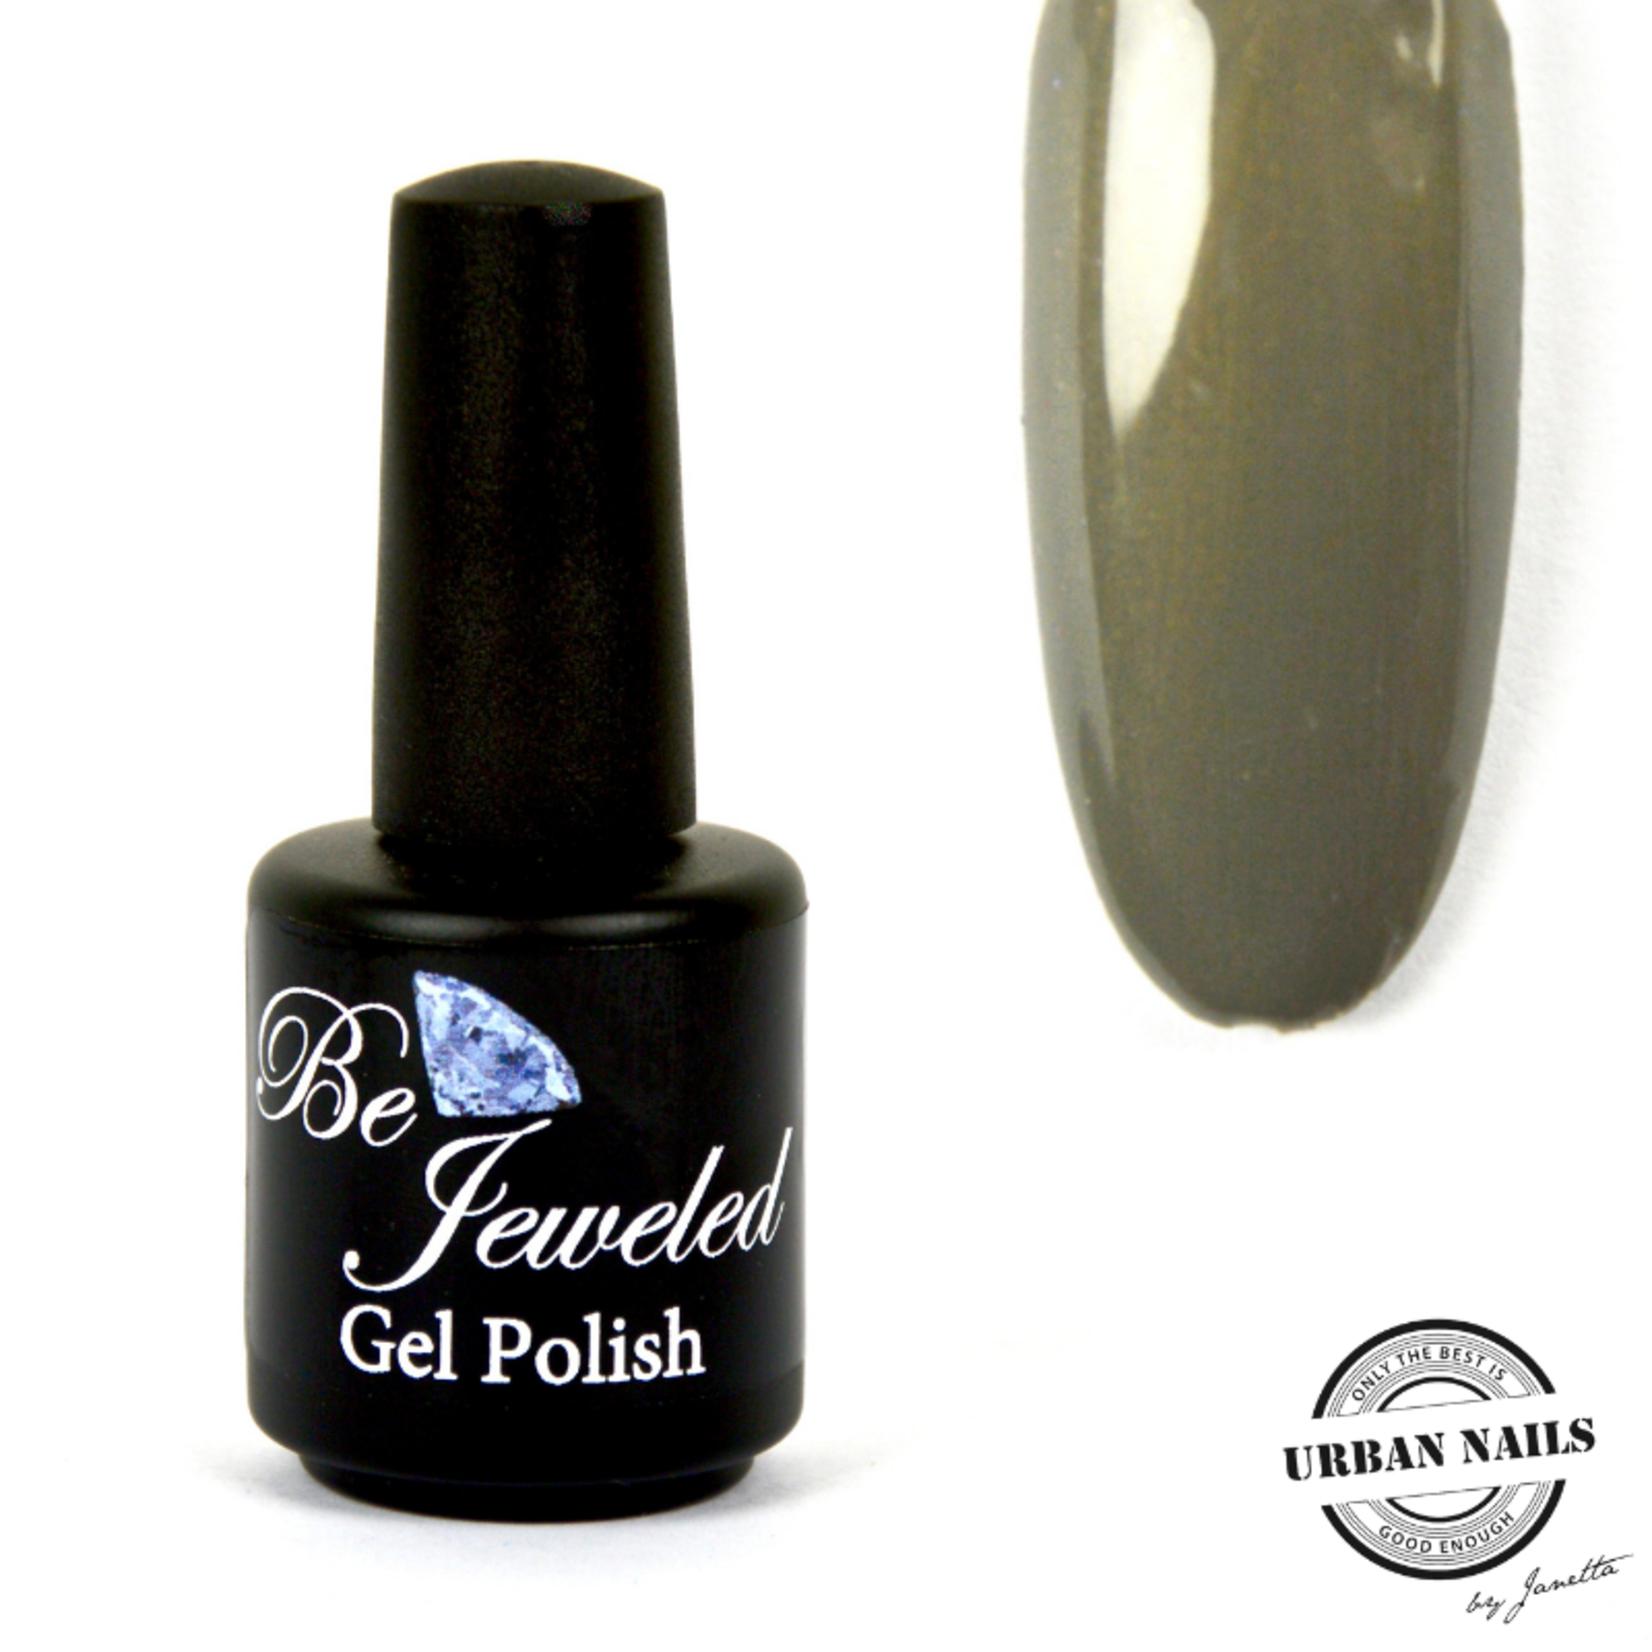 Urban Nails Be Jeweled Gelpolish 11 Groen/Grijs Met Shimmer